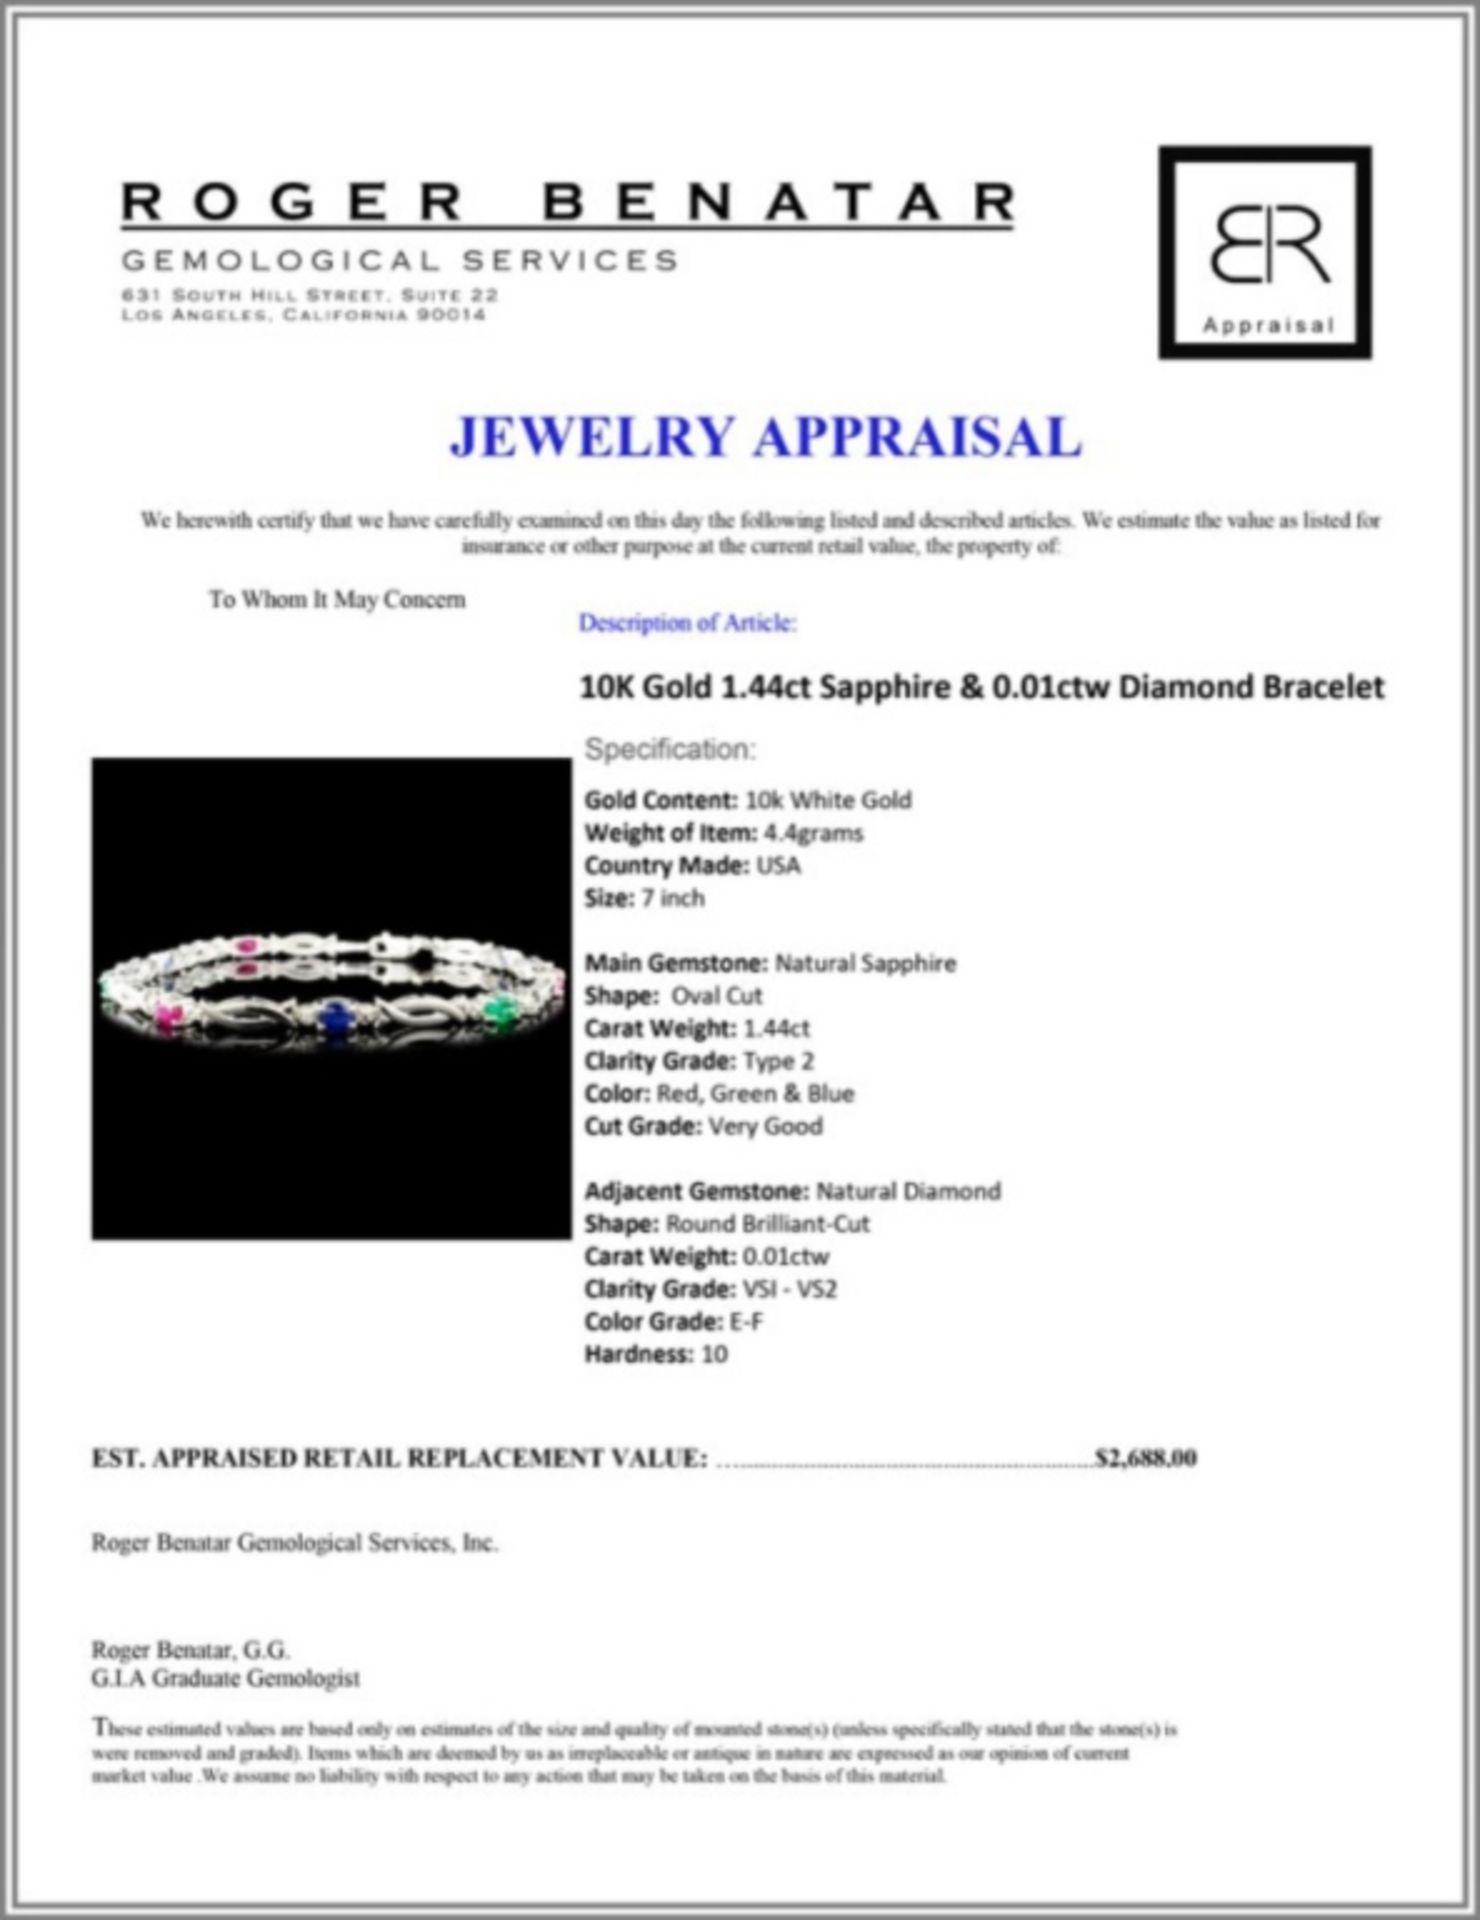 10K Gold 1.44ct Sapphire & 0.01ctw Diamond Bracele - Image 4 of 4